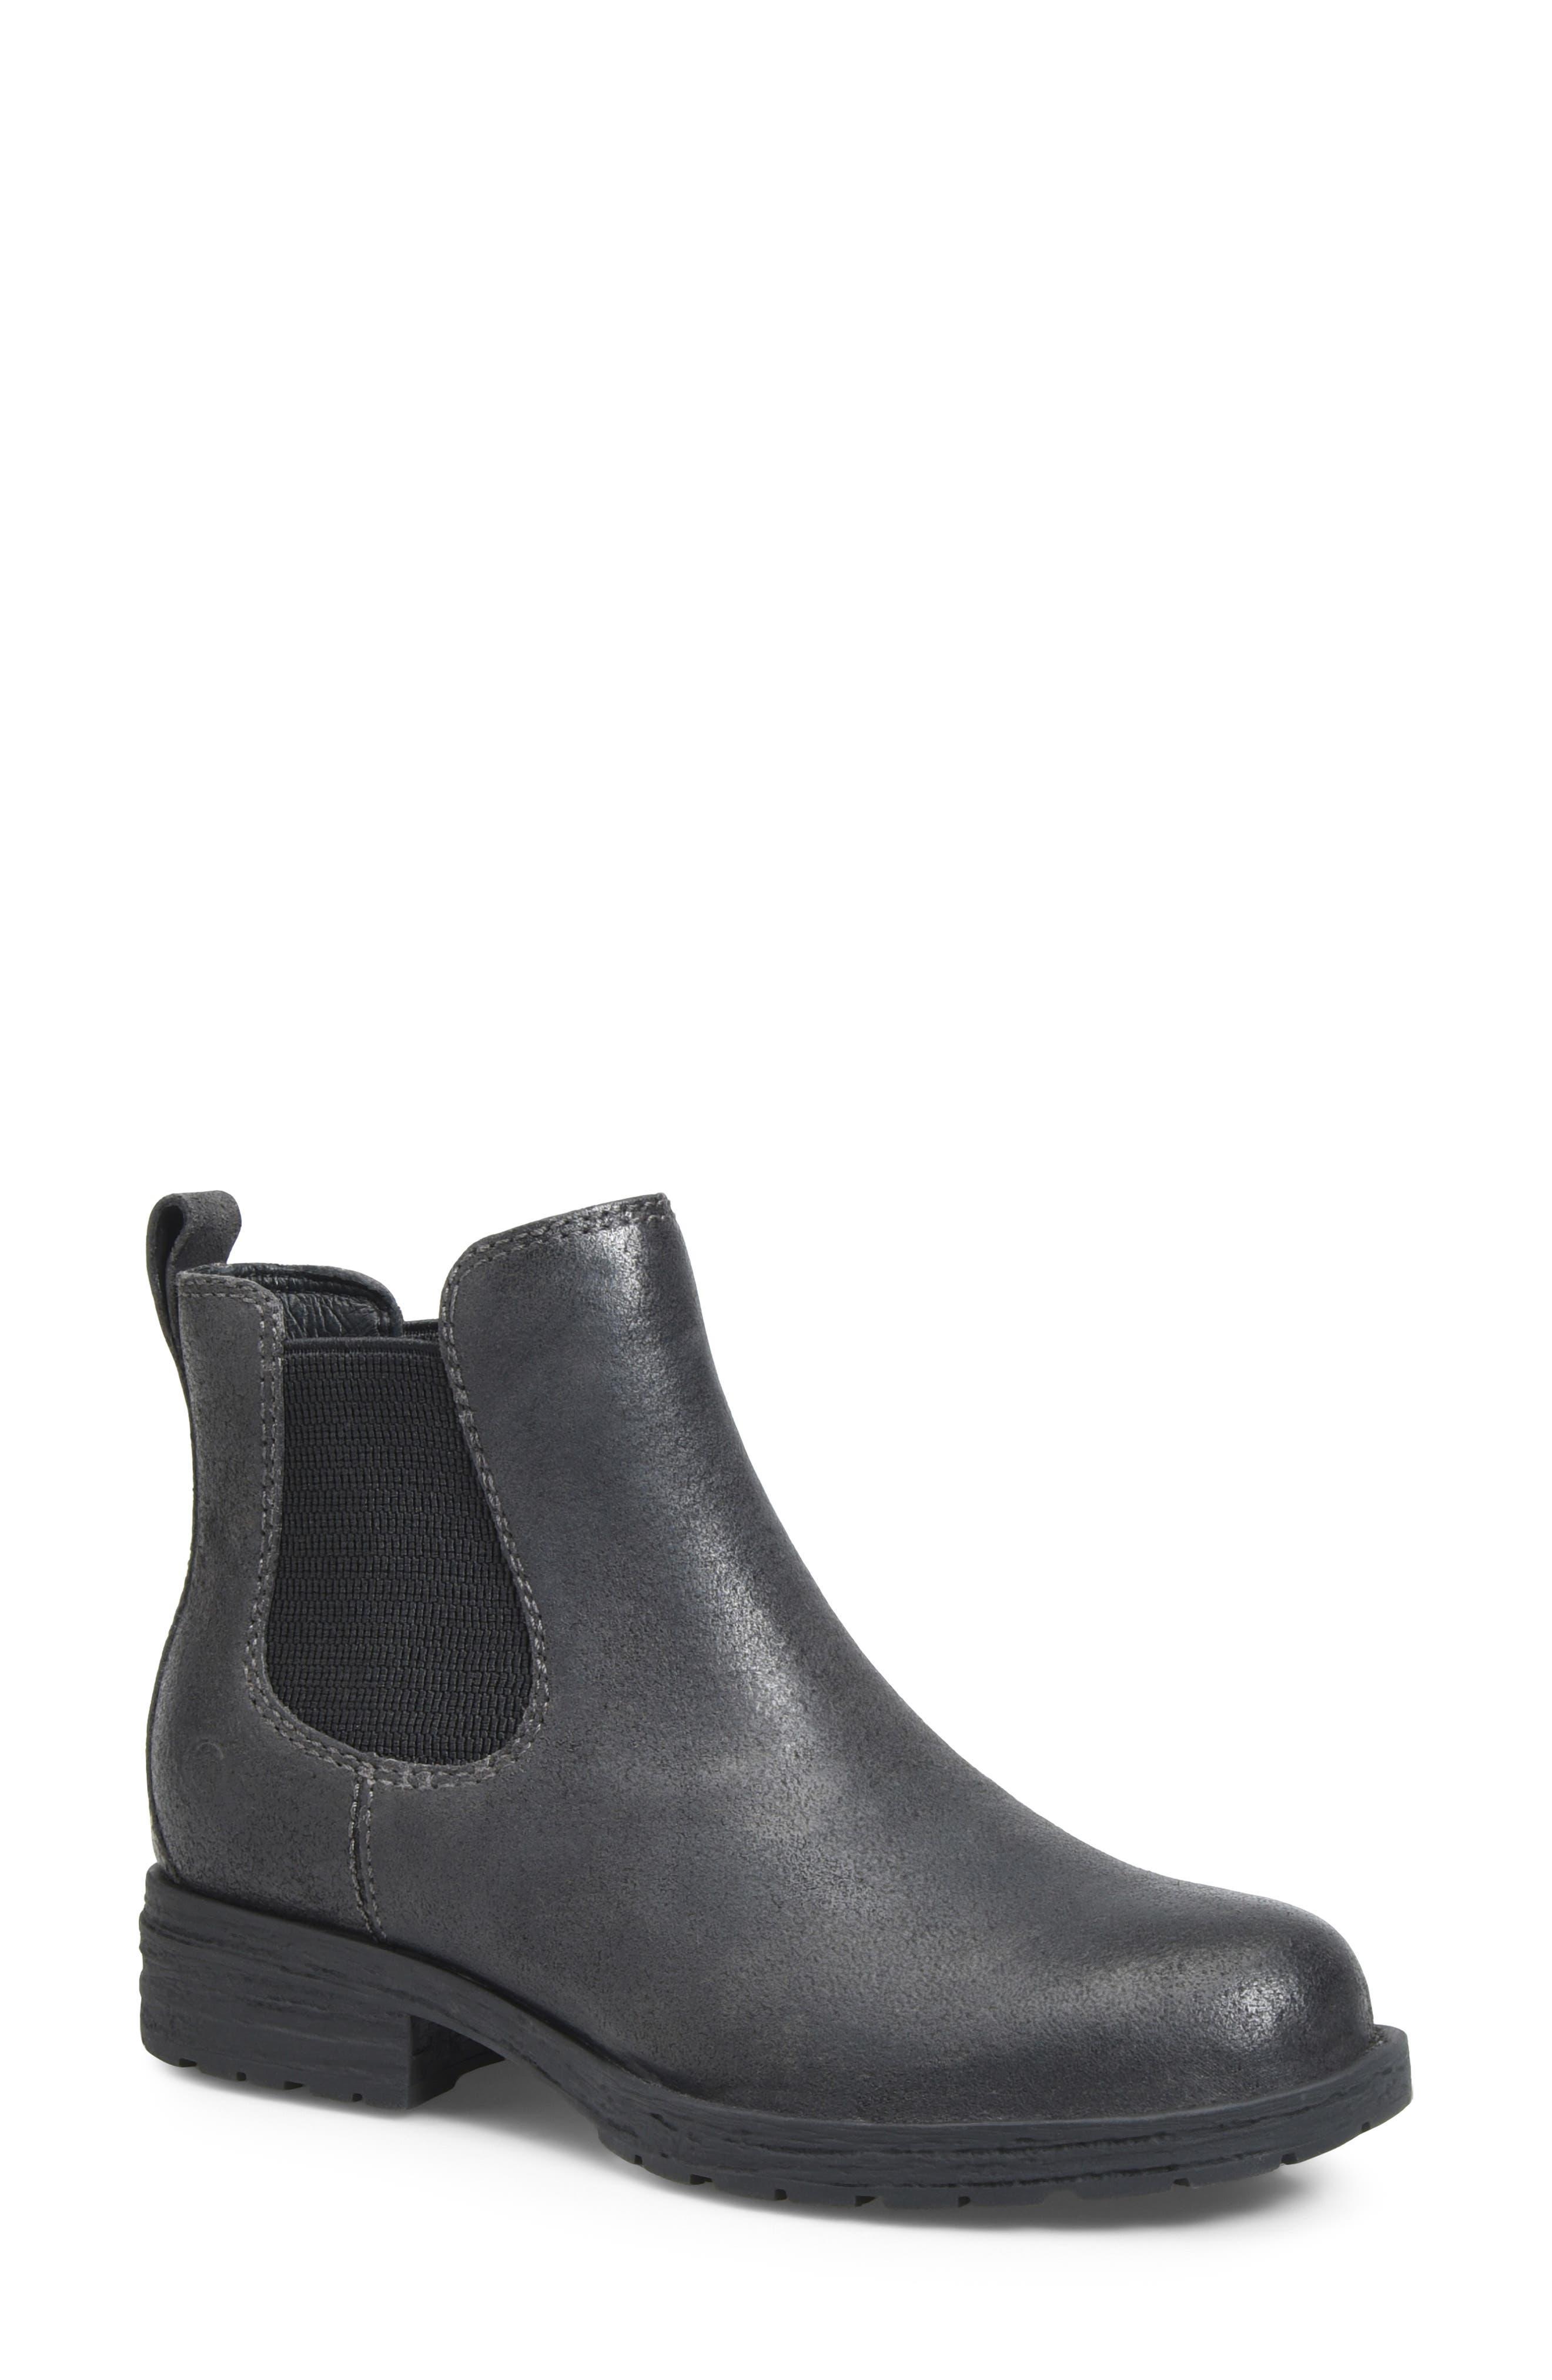 B?rn Cove Waterproof Chelsea Boot, Grey